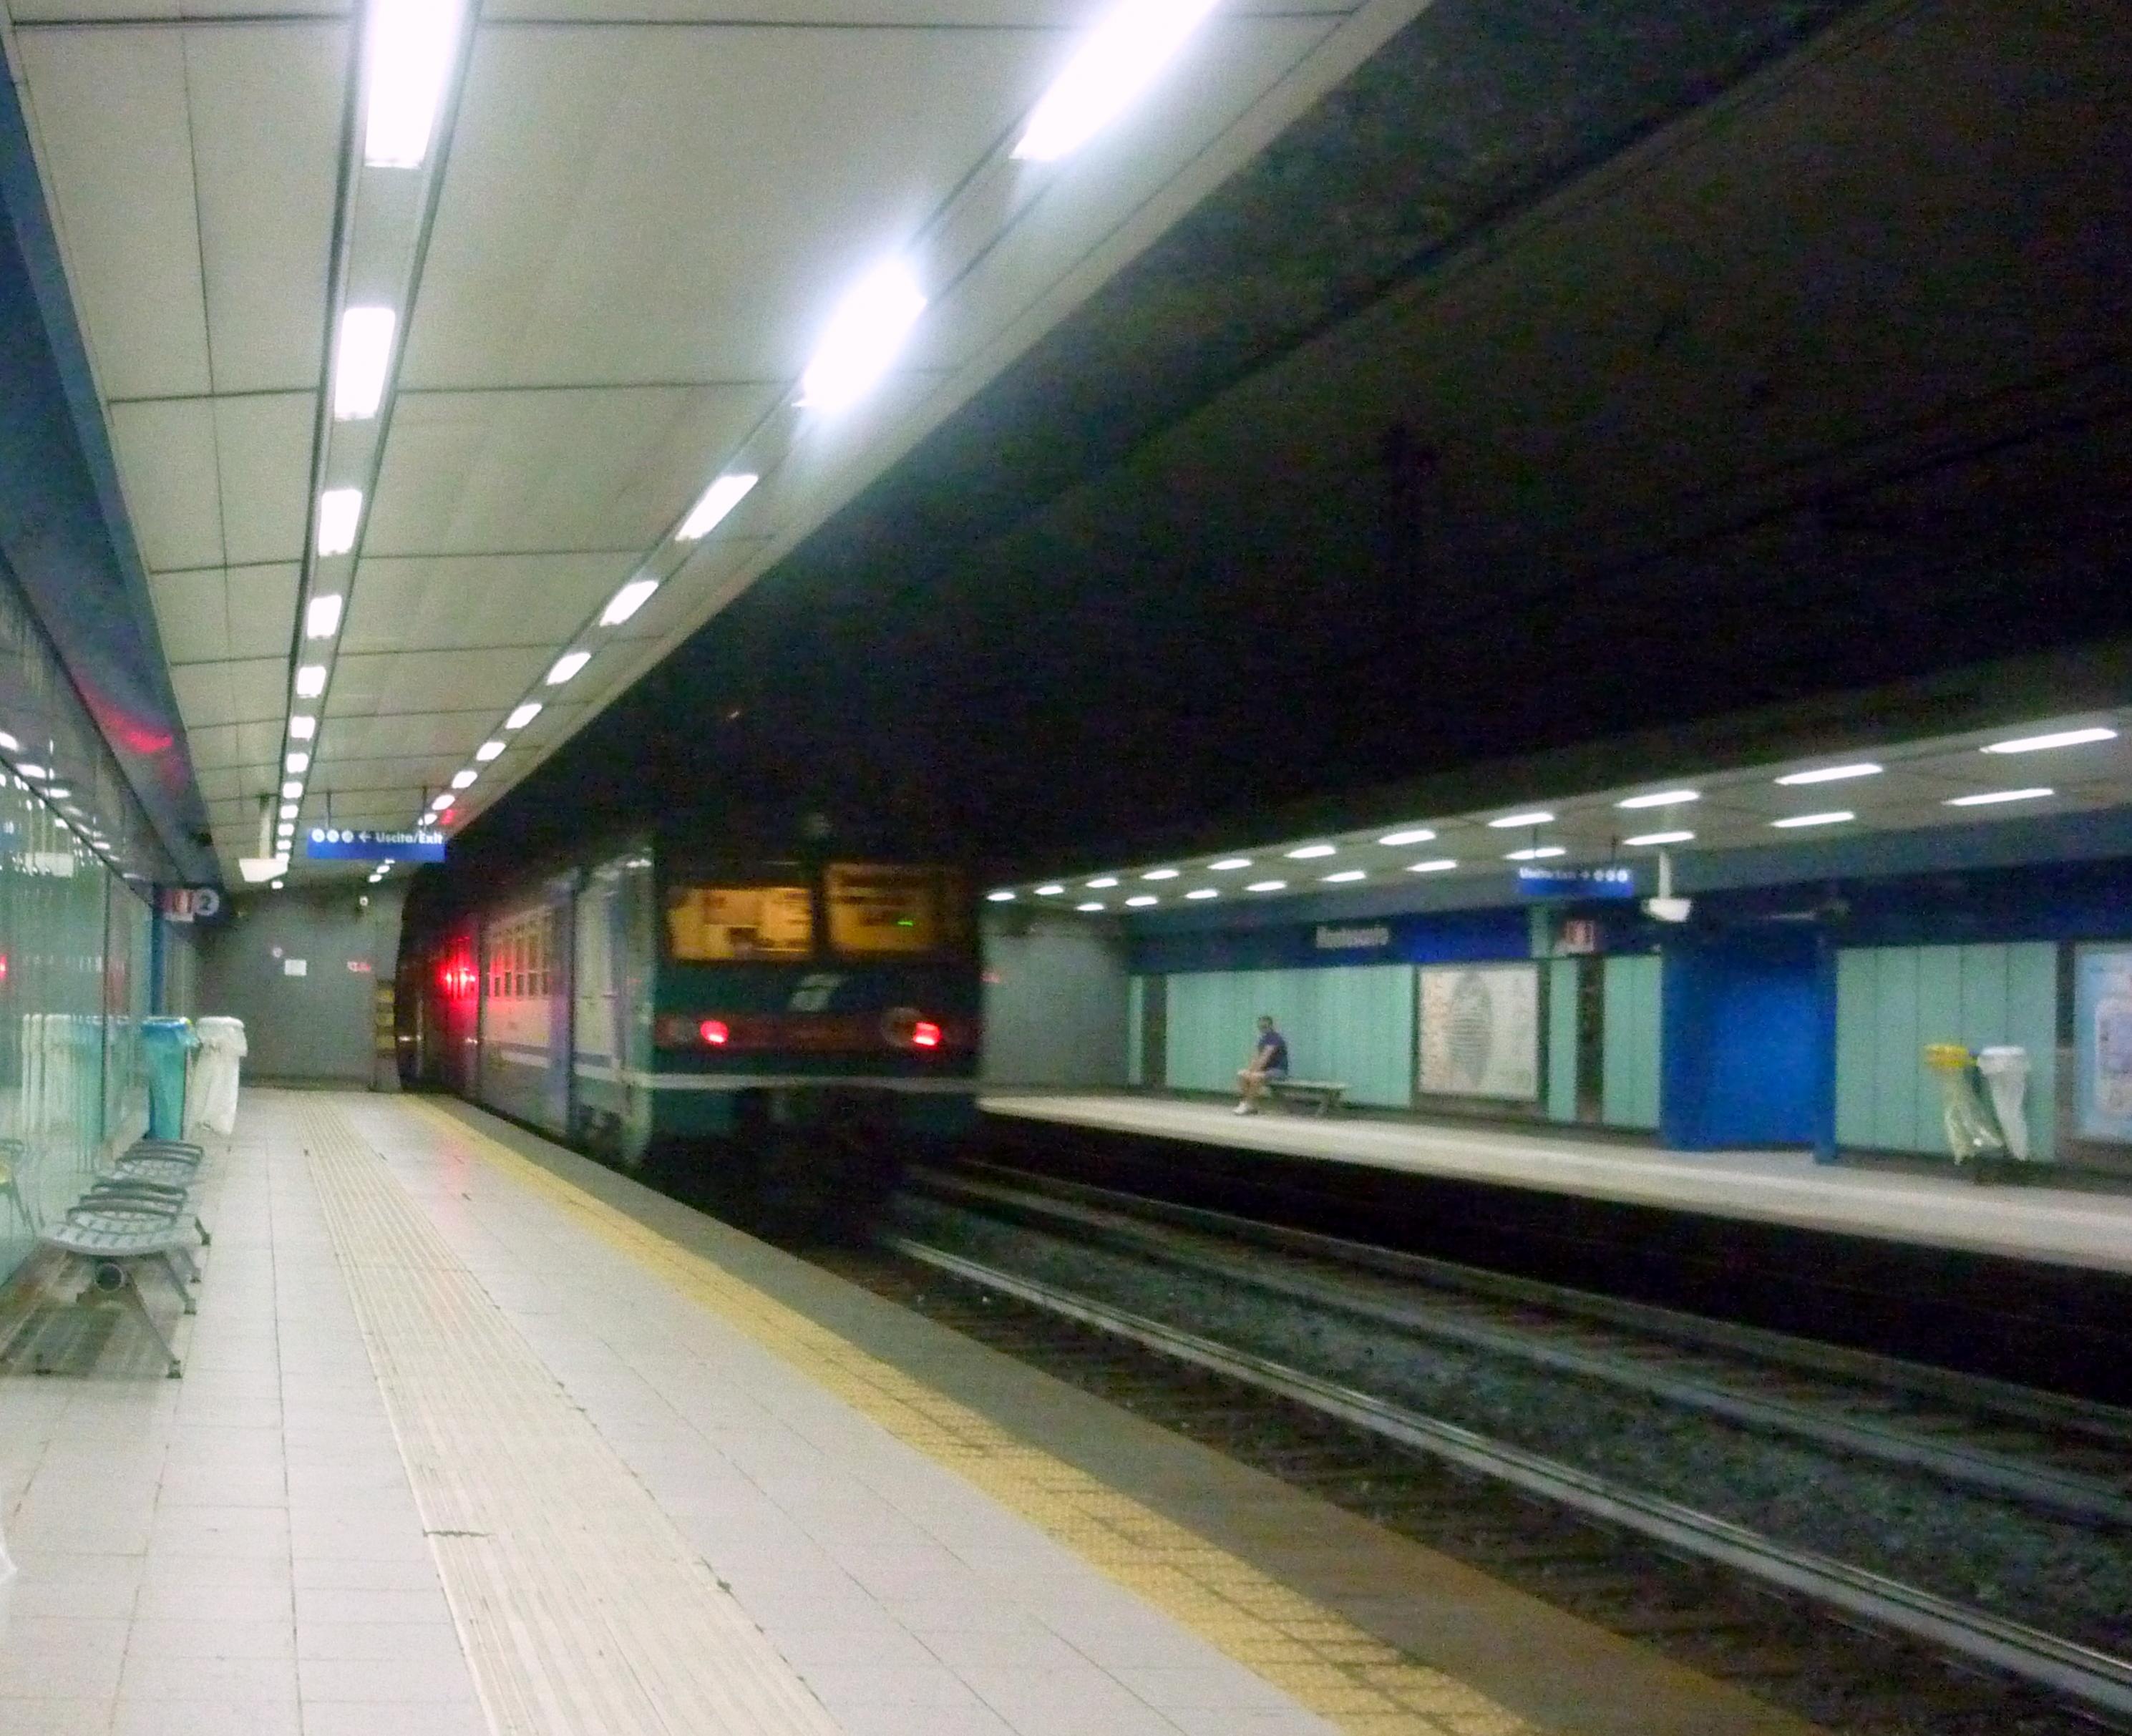 roma metropolitana linea blu salerno - photo#30